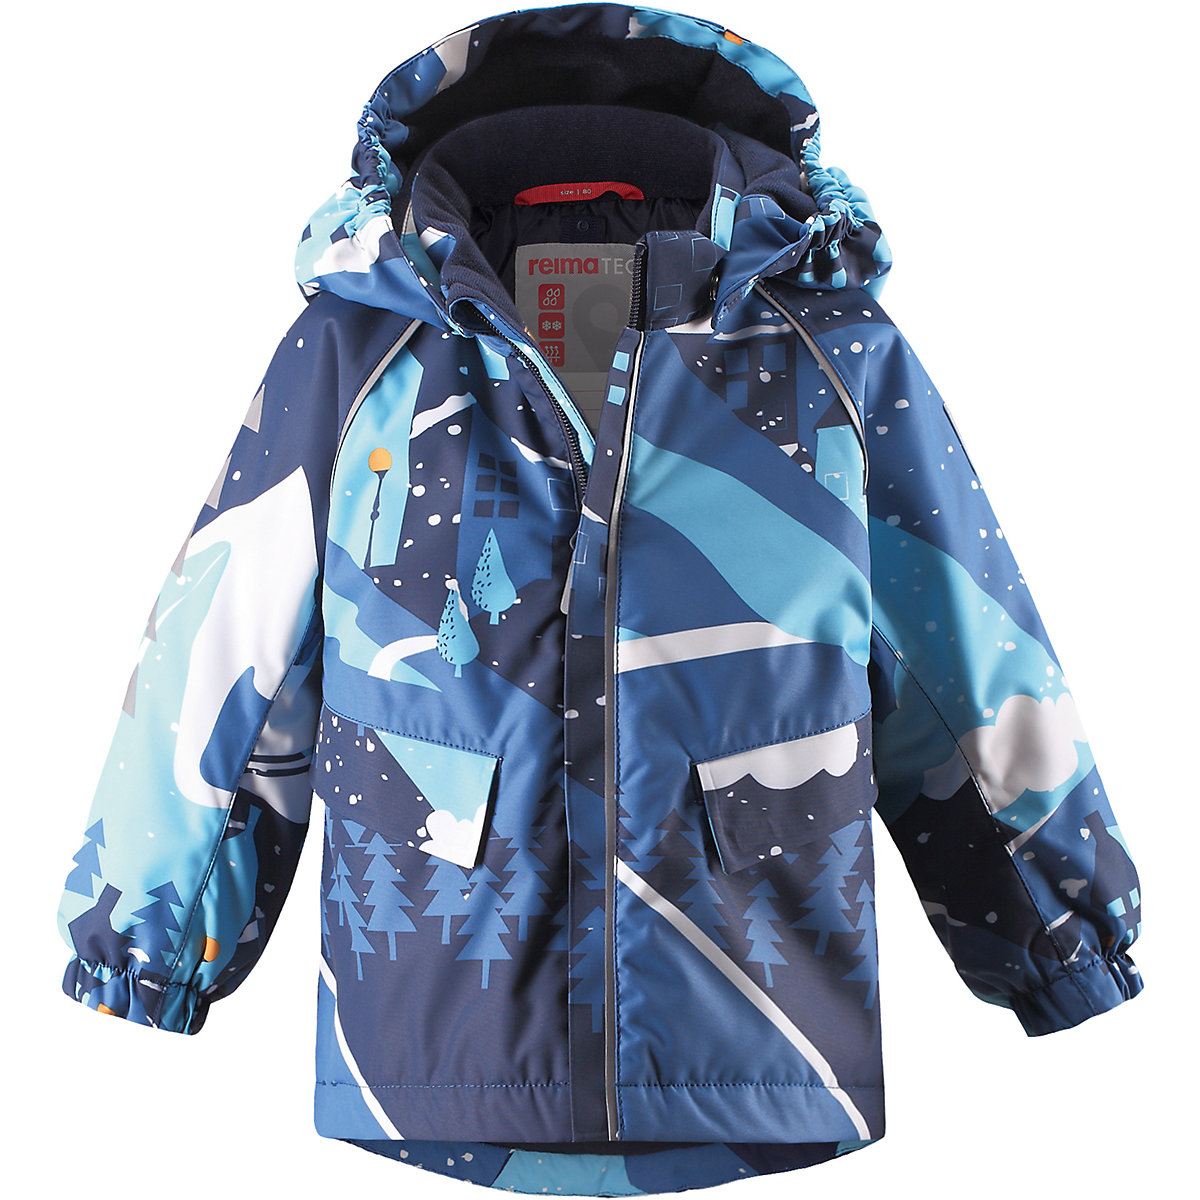 REIMA Jackets 8689187 For boys Polyester  winter fur baby clothing boy Jacket santic mc07004v outdoor cycling windproof sunproof polyester jacket for men fluorescent green xl